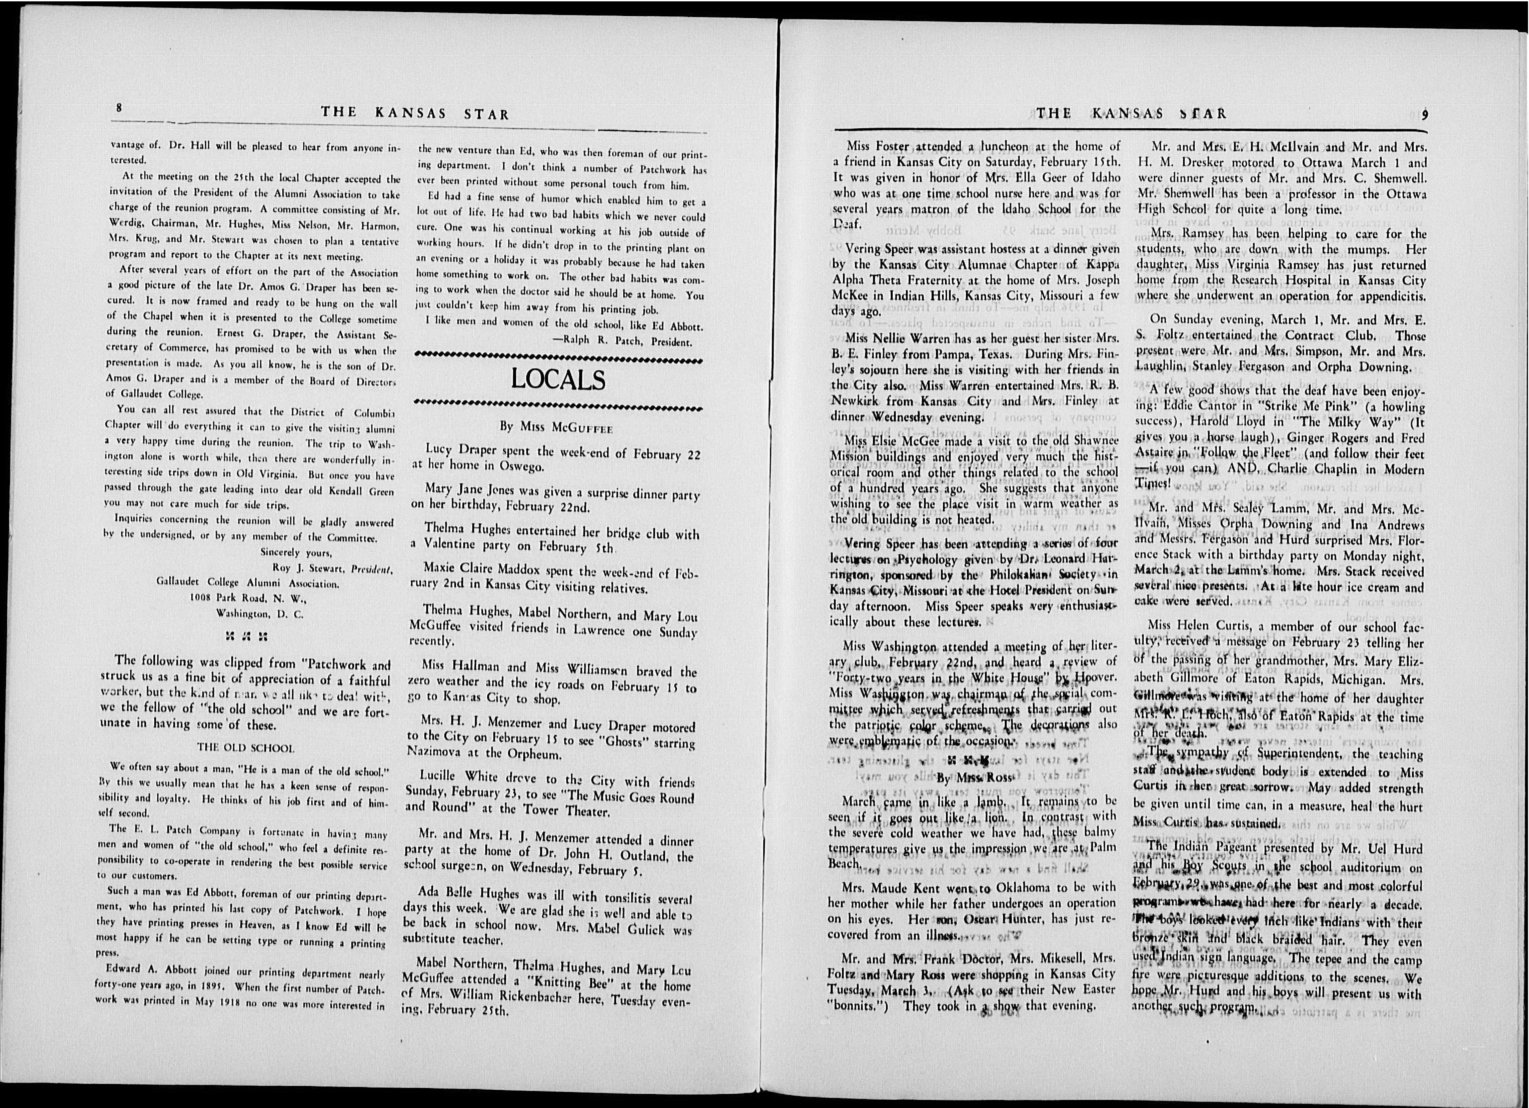 The Kansas Star, volume 50, number 5 - 8-9